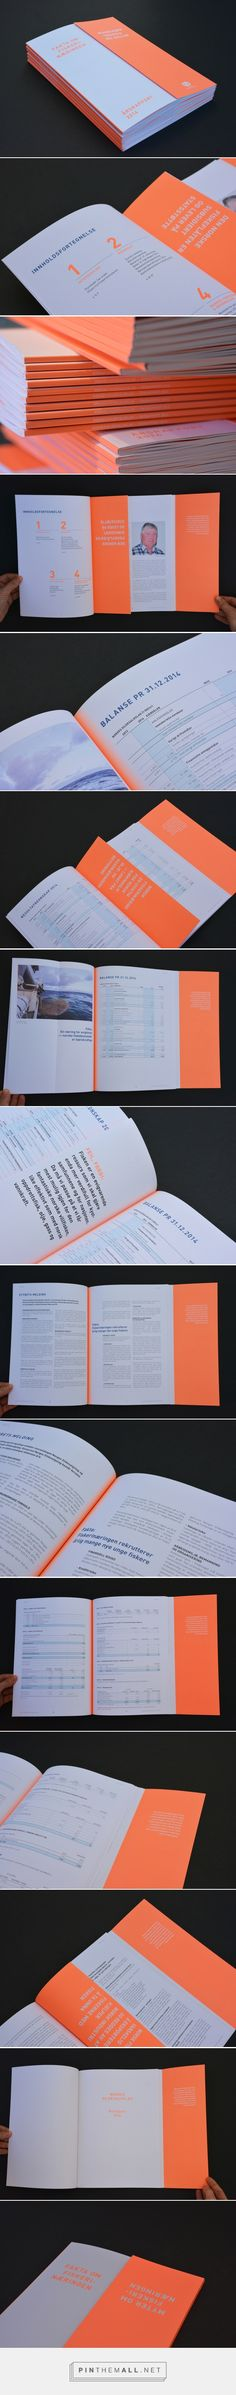 Myths and facts — Annual report for Norges Sildesalgslag. Design by Designbyrået…